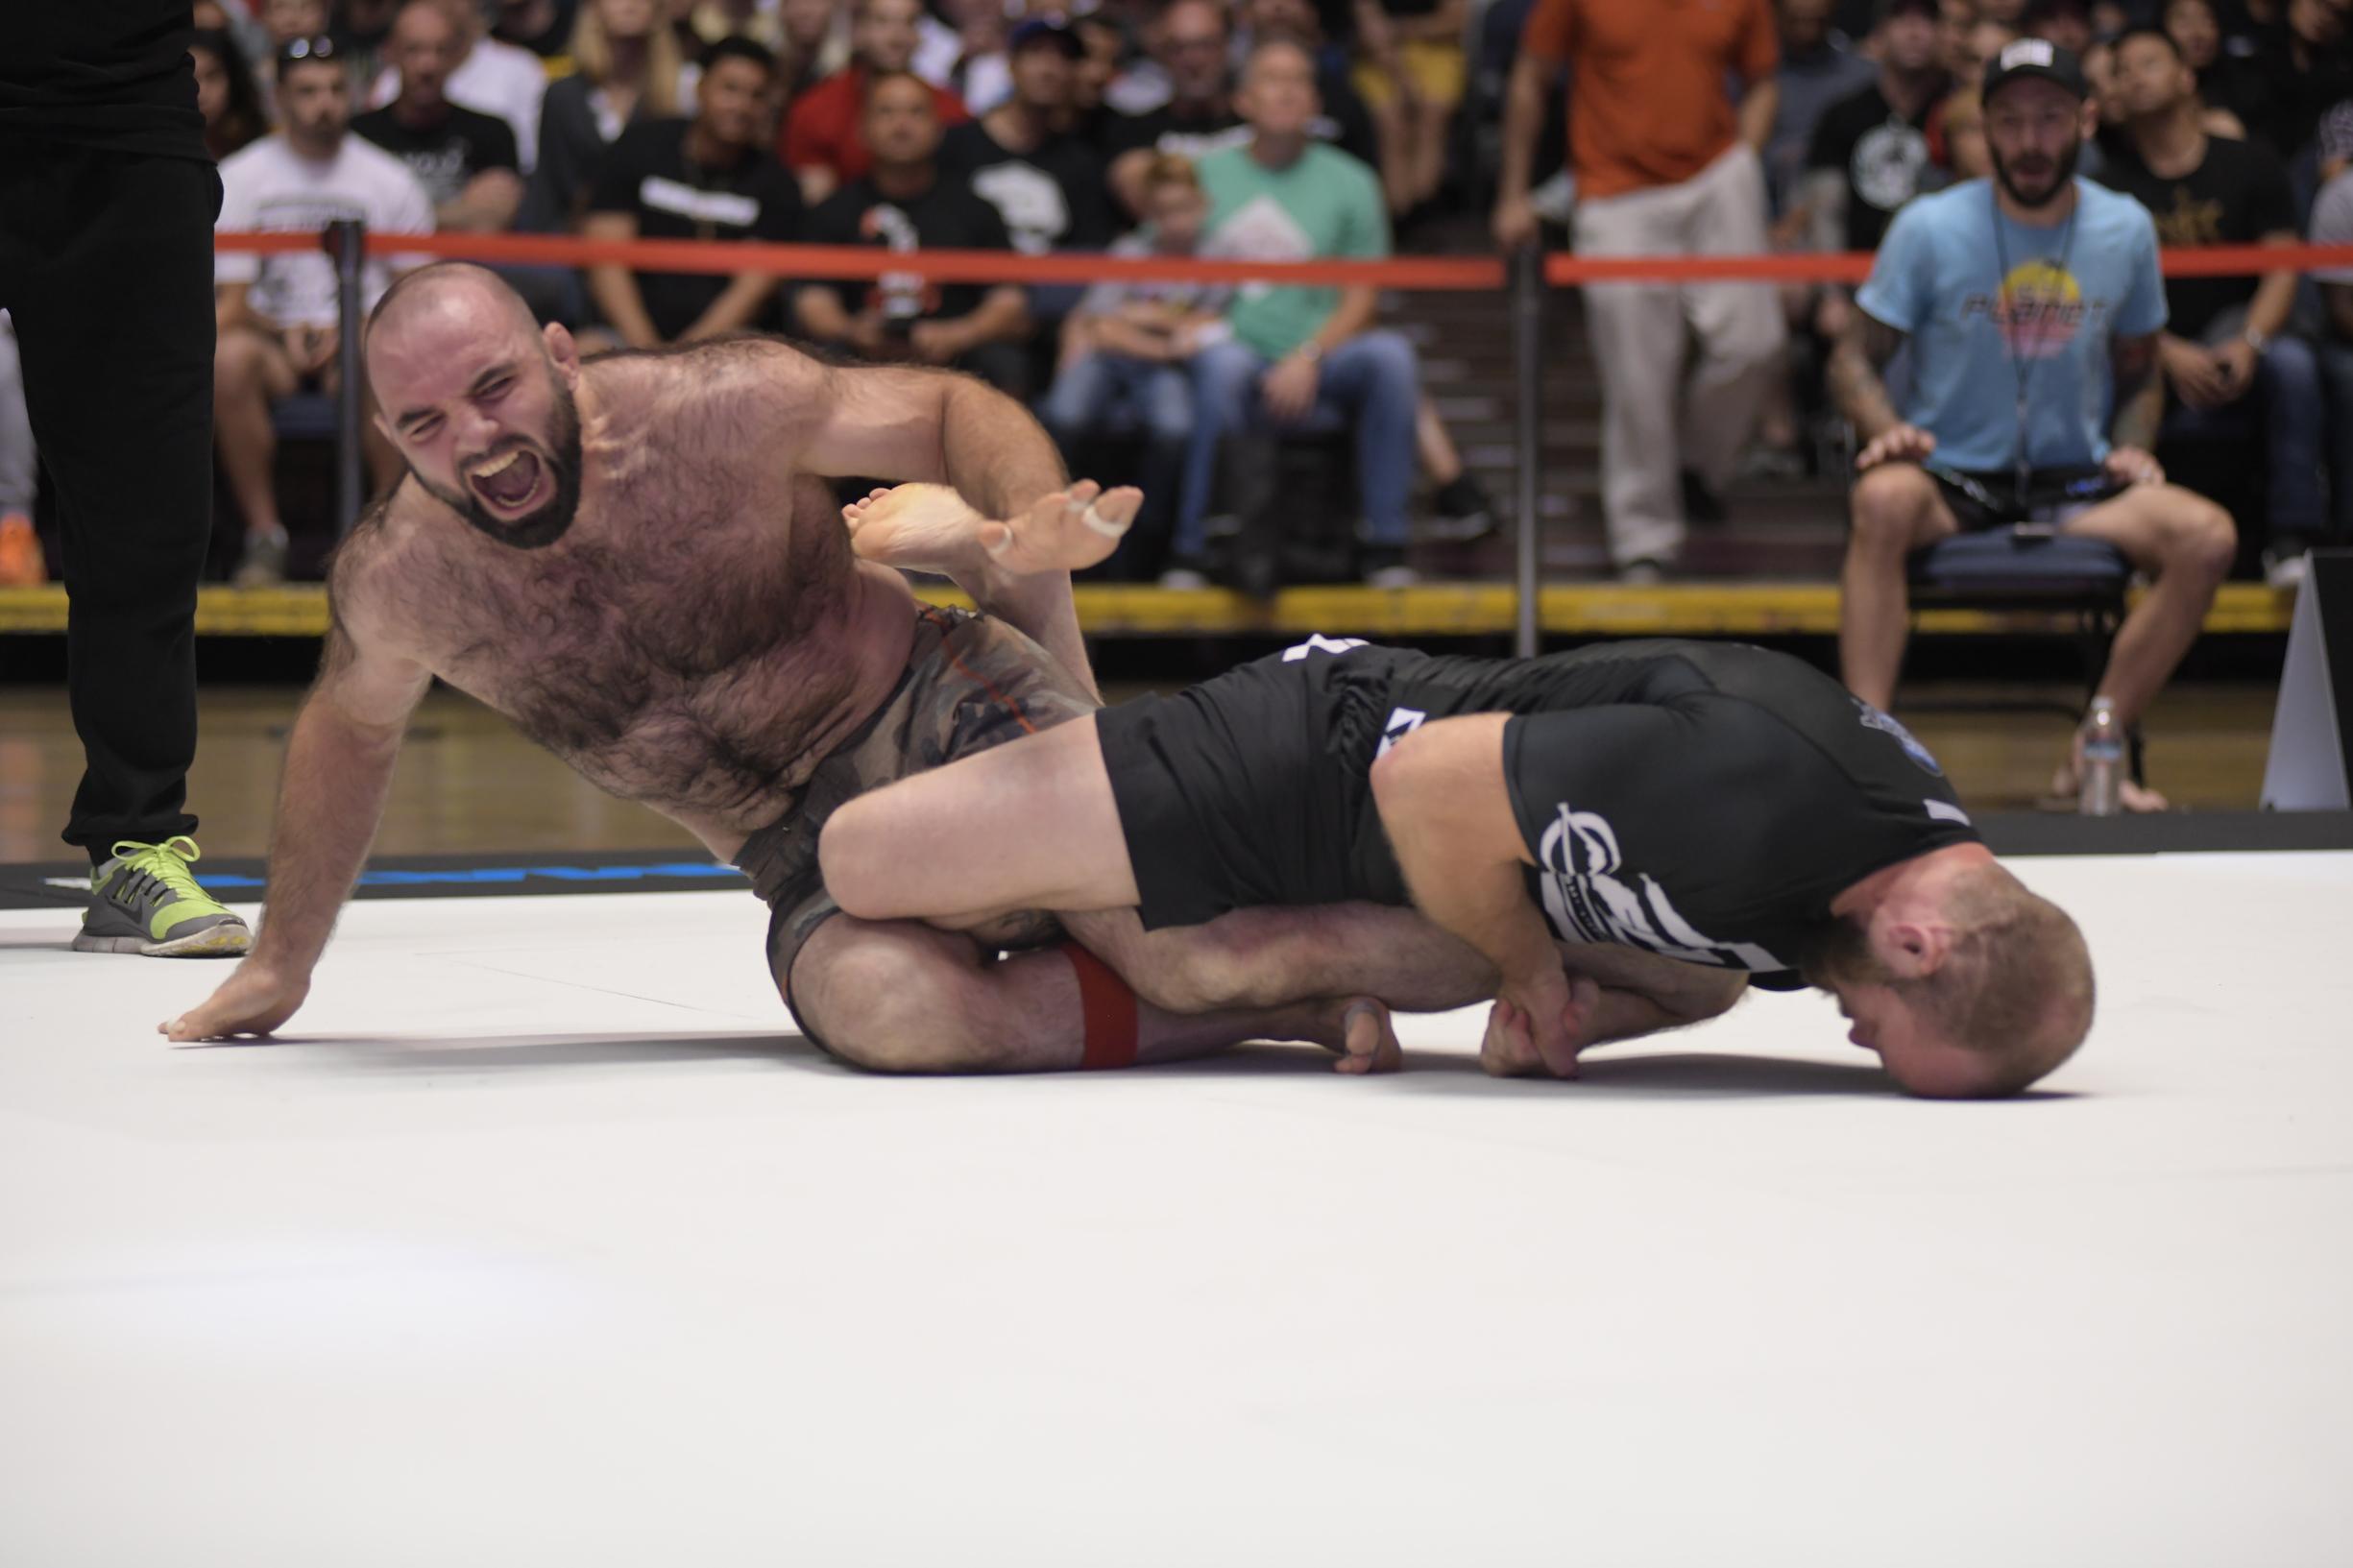 UFC 234 results - Israel Adesanya vs Anderson Silva